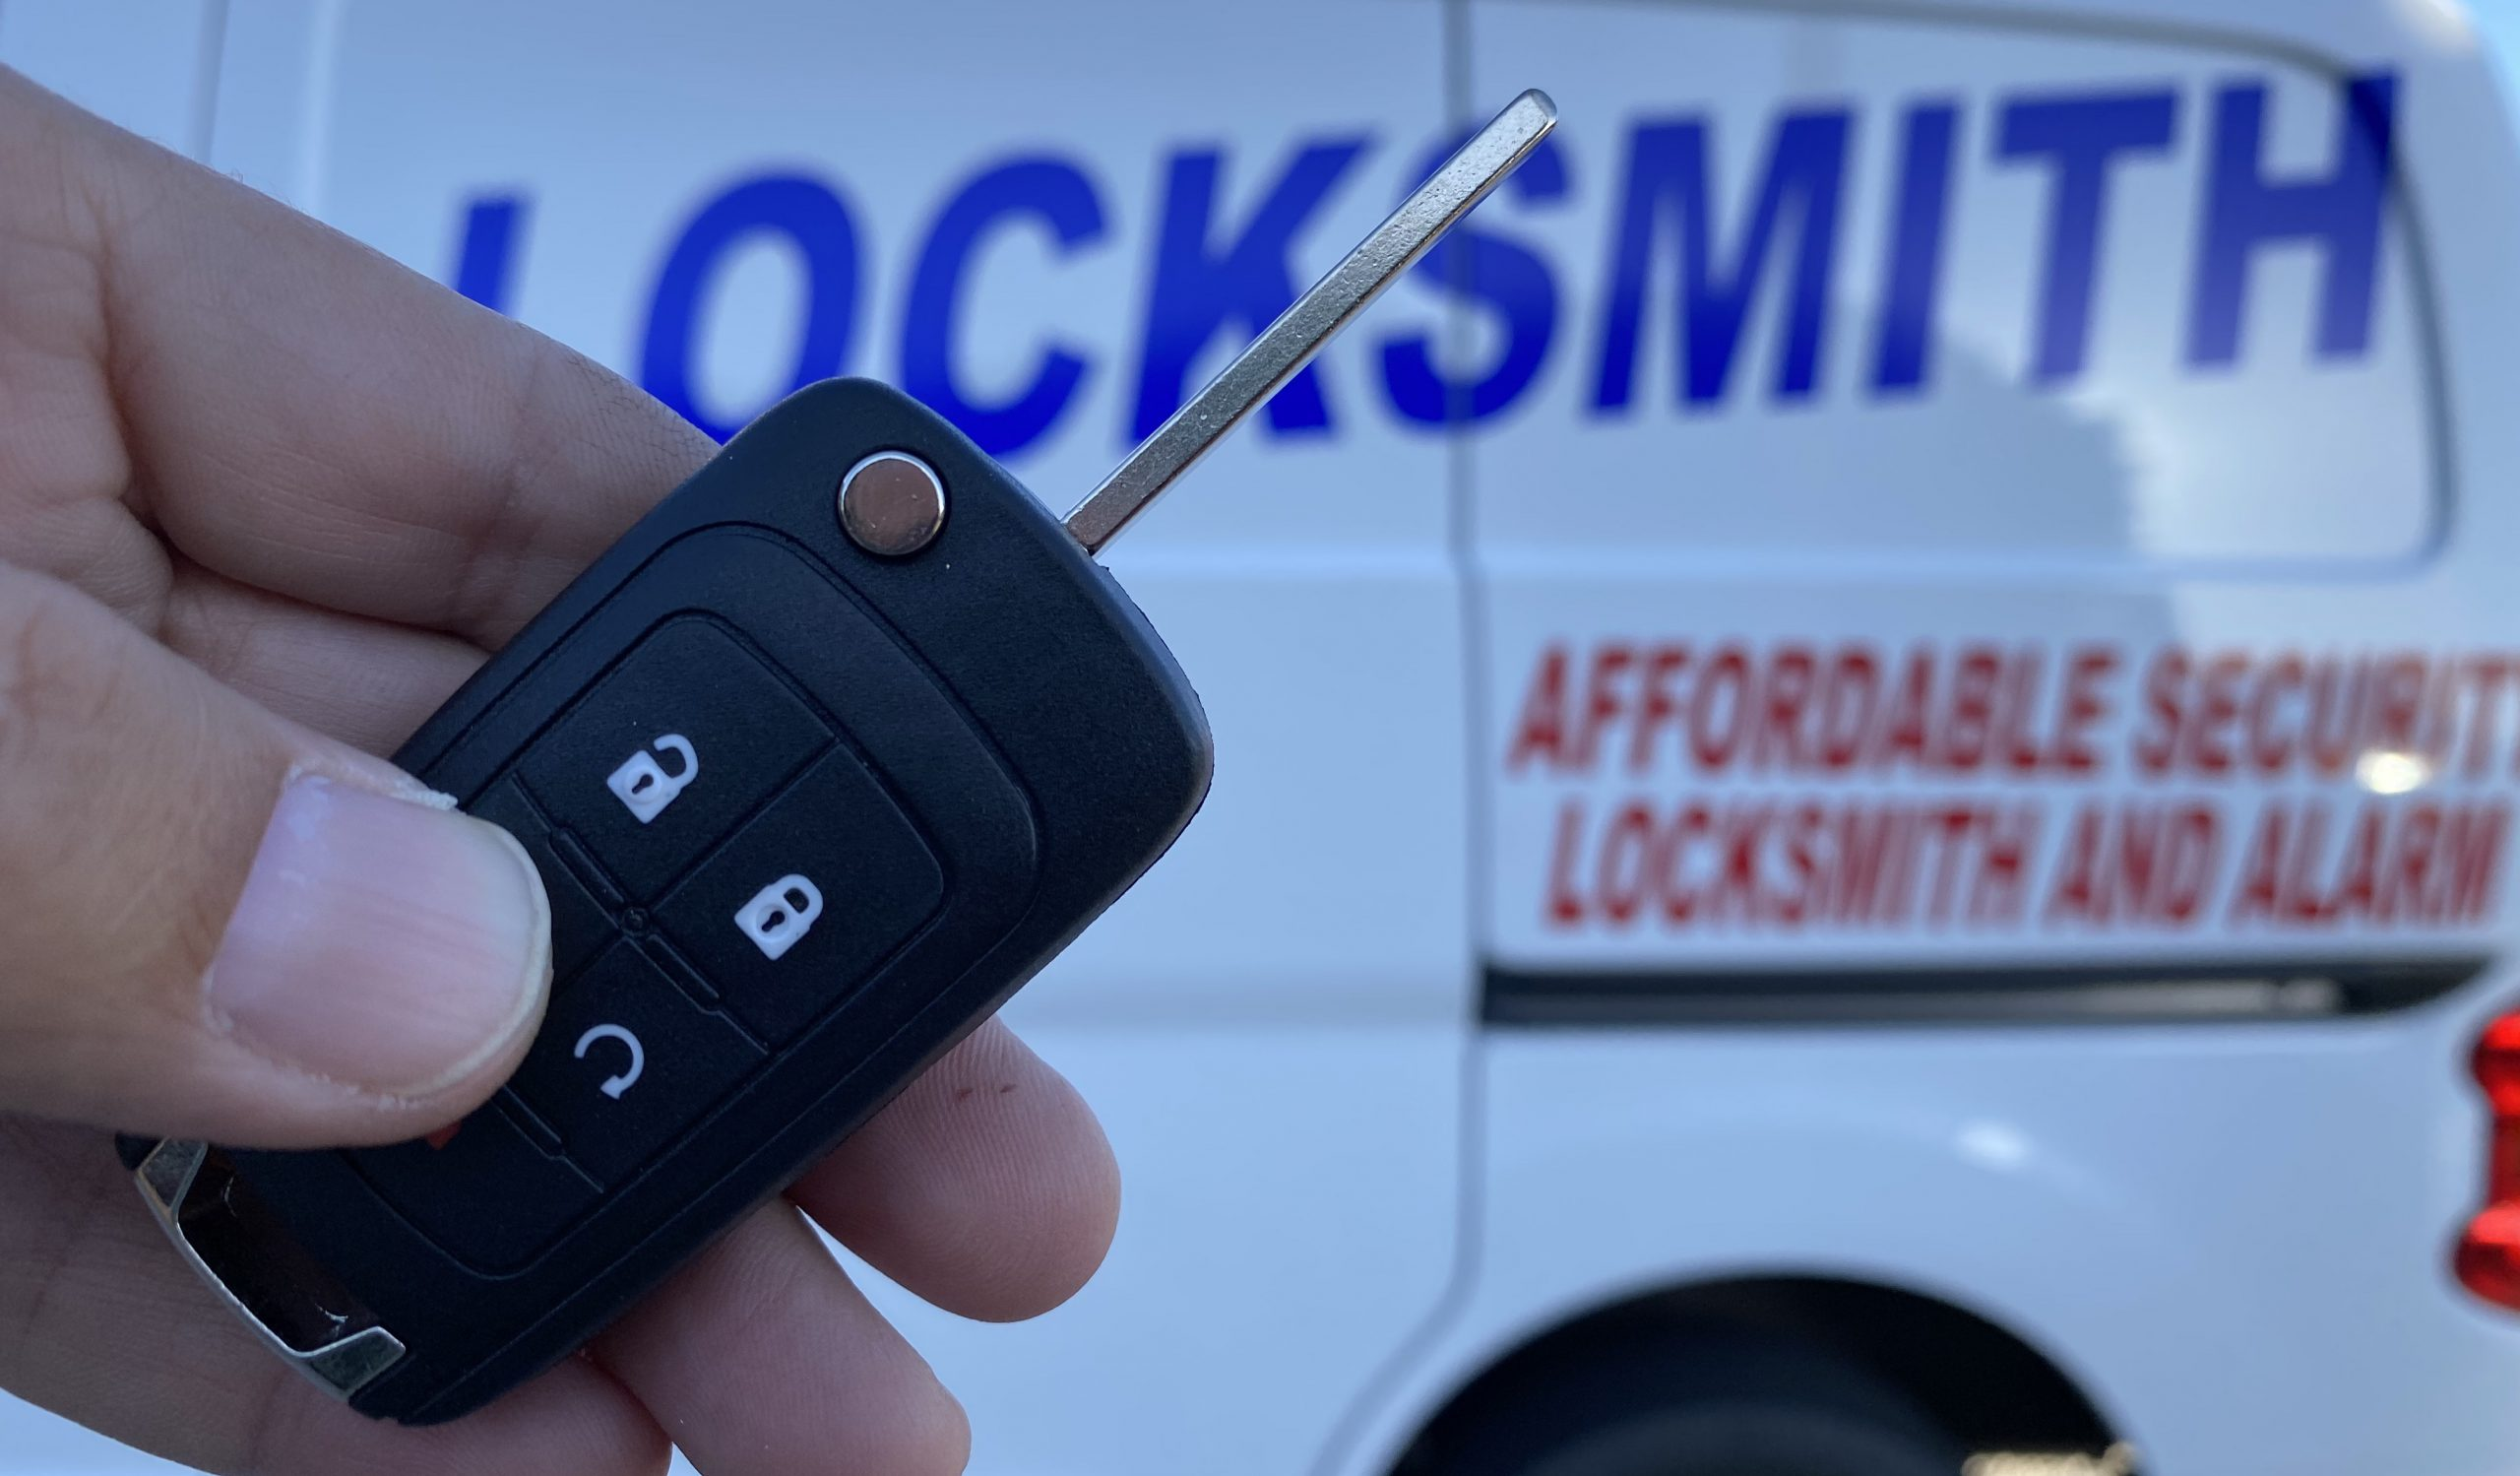 Locksmith Yuma Vehicles